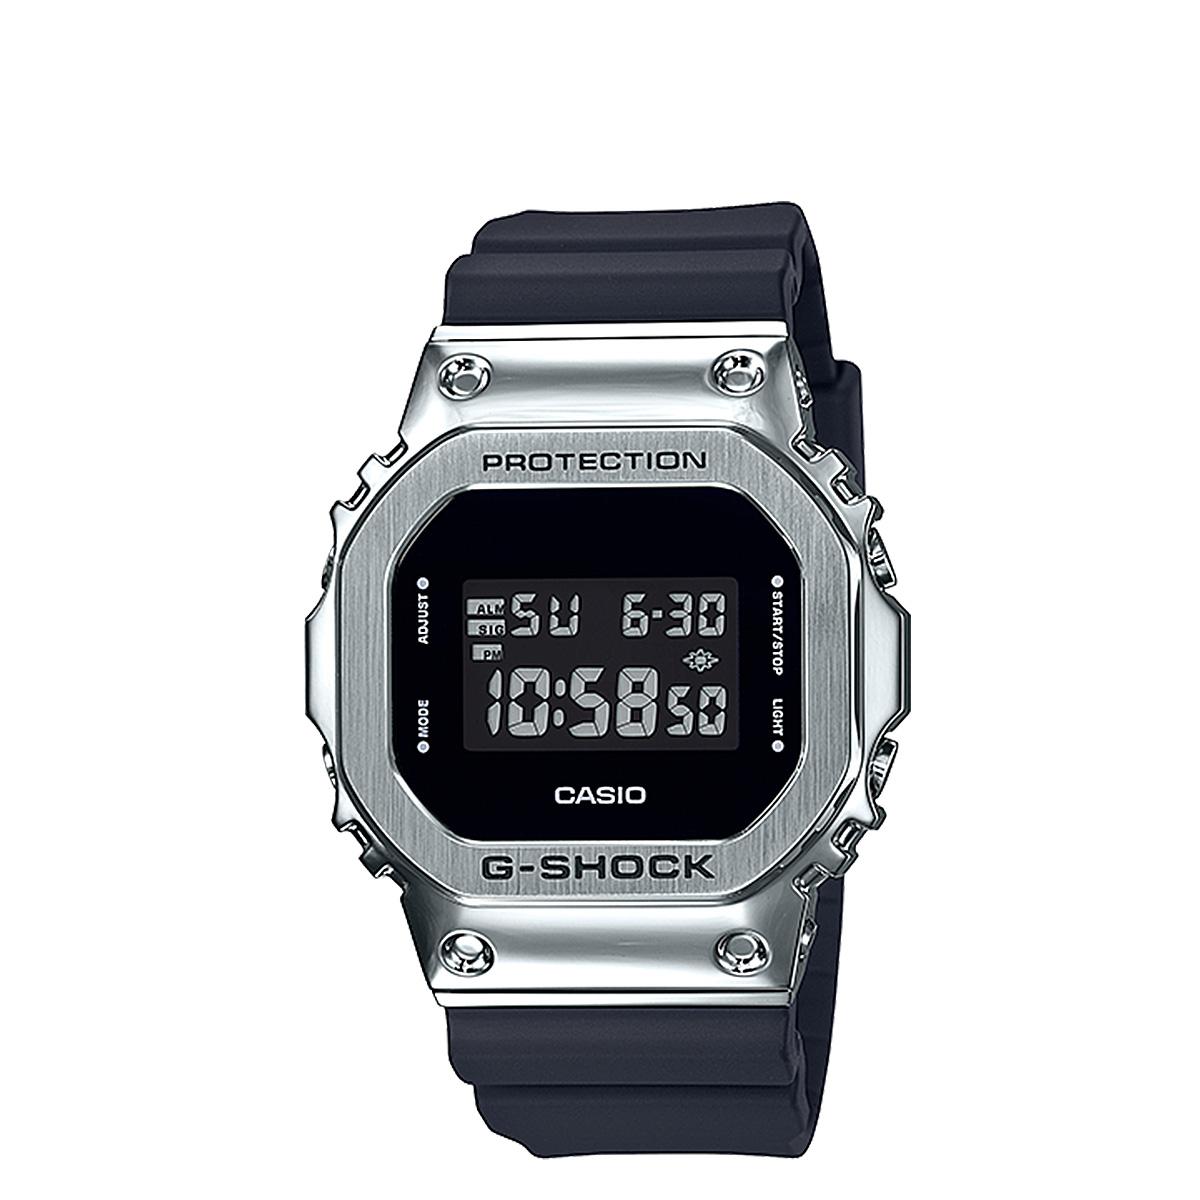 CASIO G-SHOCK カシオ 腕時計 GM-5600-1JF ジーショック Gショック G-ショック メンズ レディース ブラック 黒